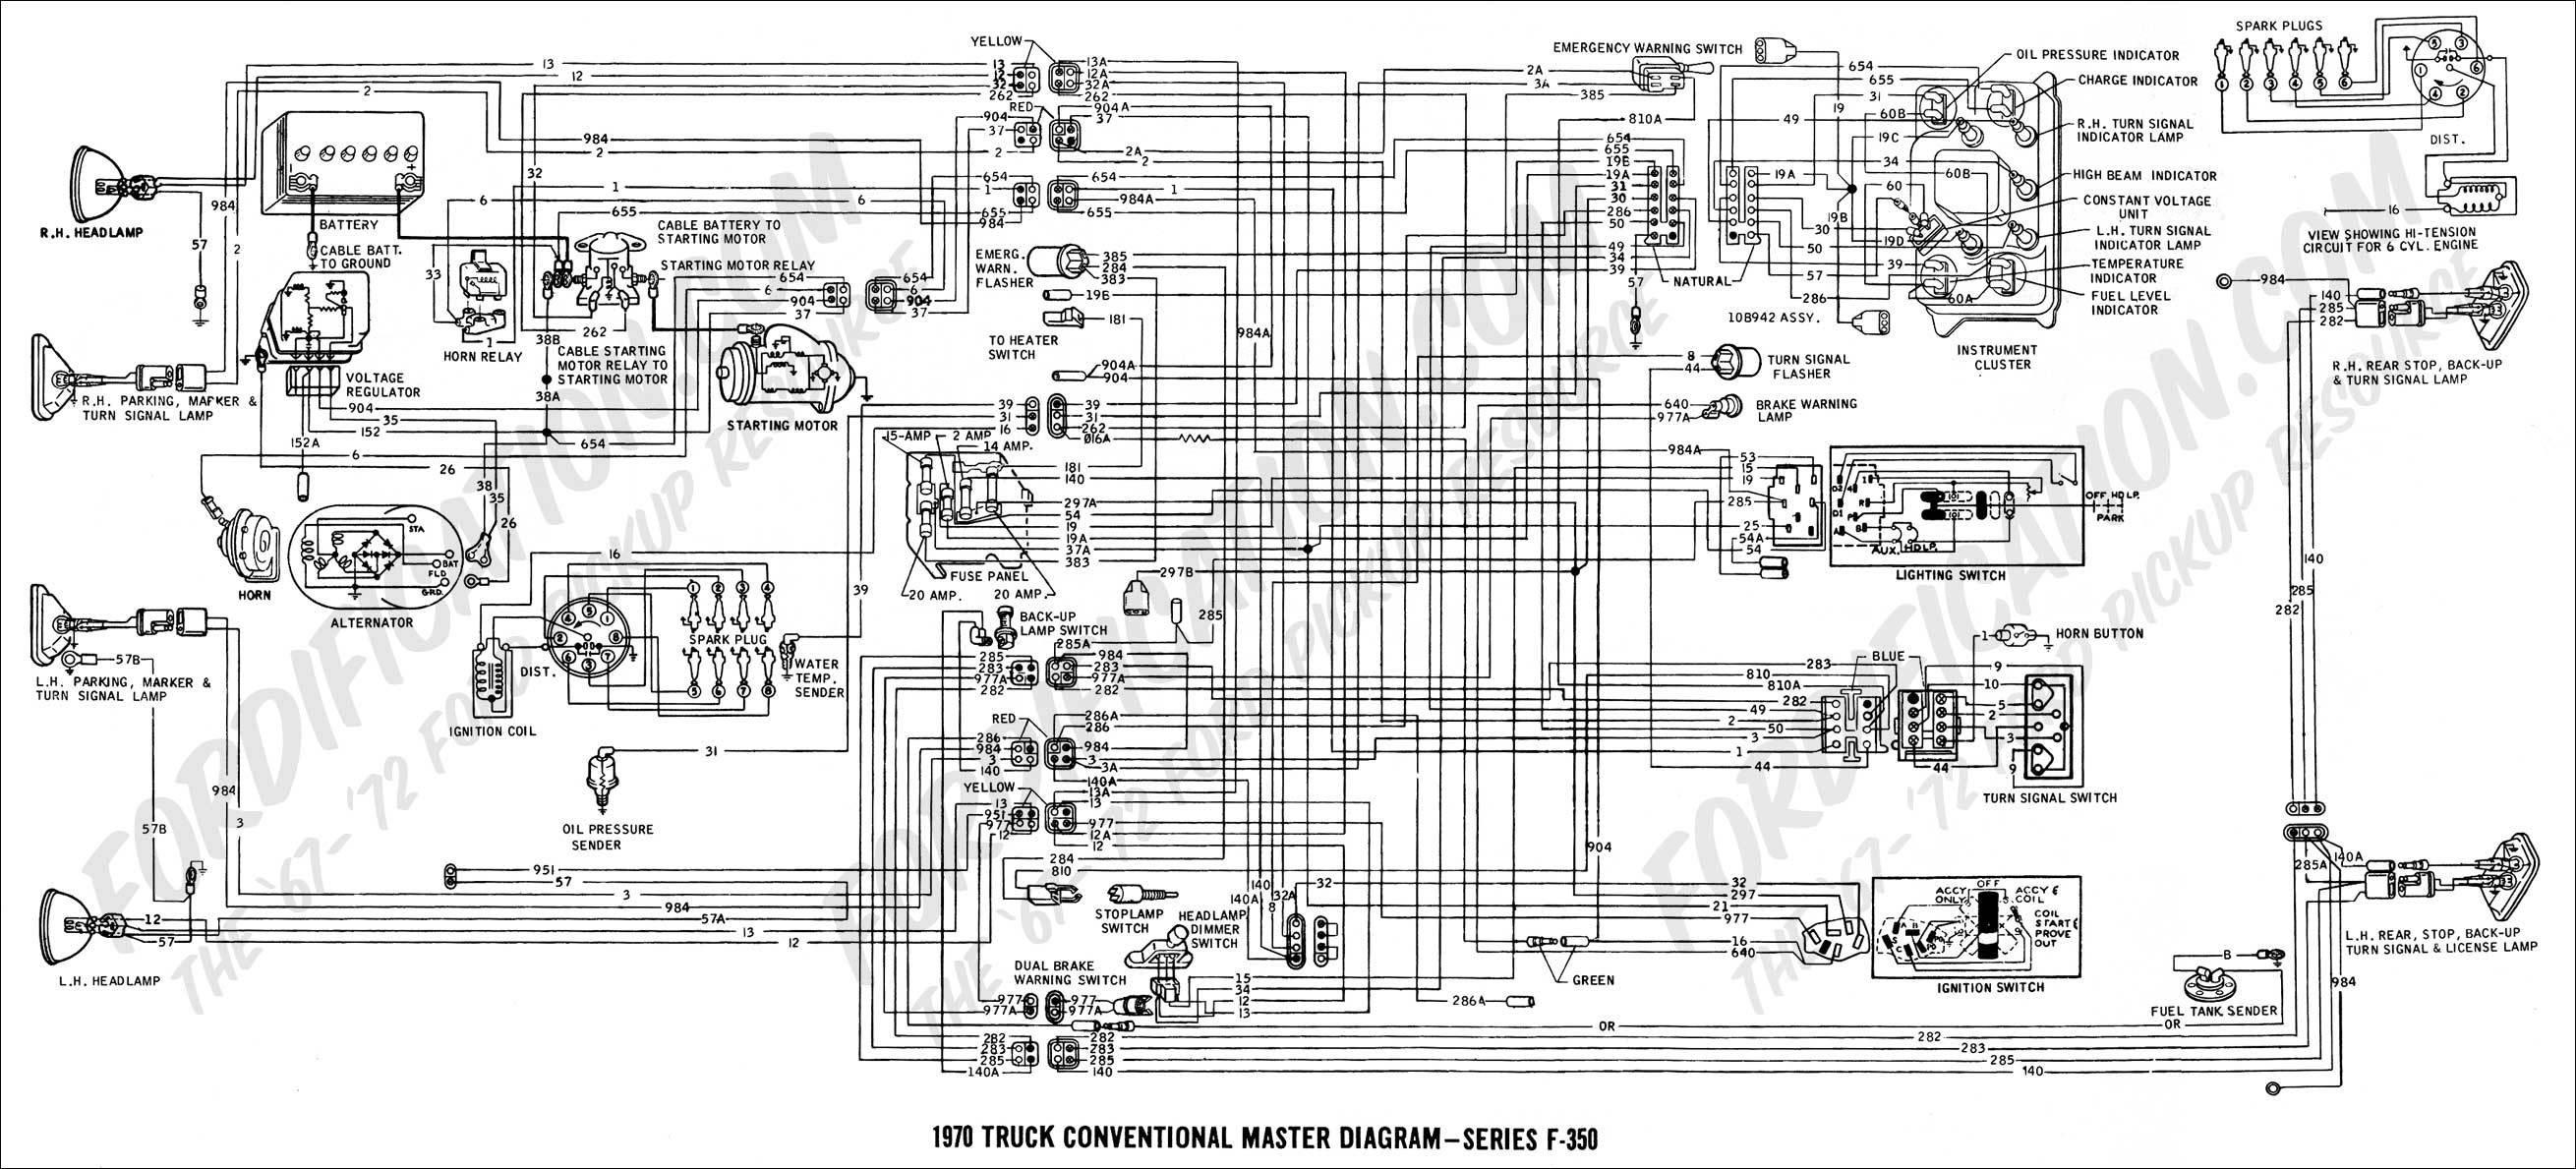 6 0 Powerstroke Engine Diagram 2 1997 ford F350 Wiring Diagram 6 Wiring Diagram Of 6 0 Powerstroke Engine Diagram 2